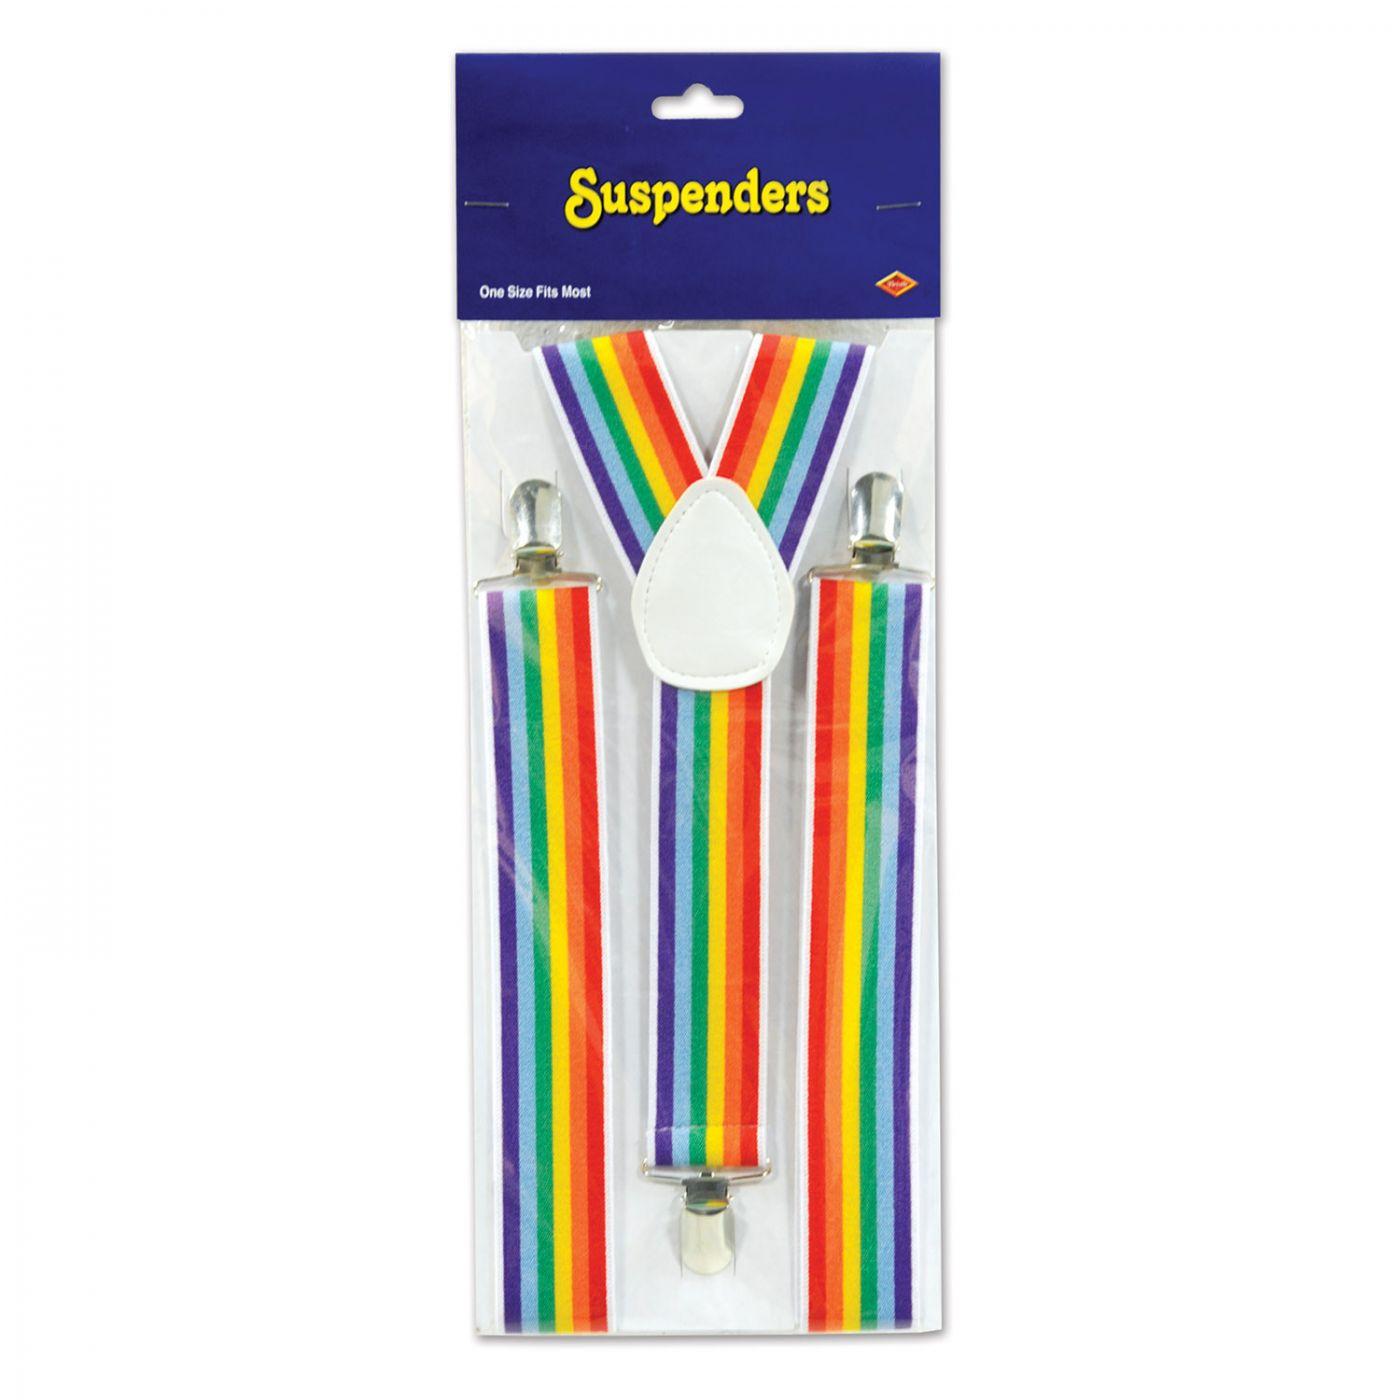 Rainbow Suspenders image